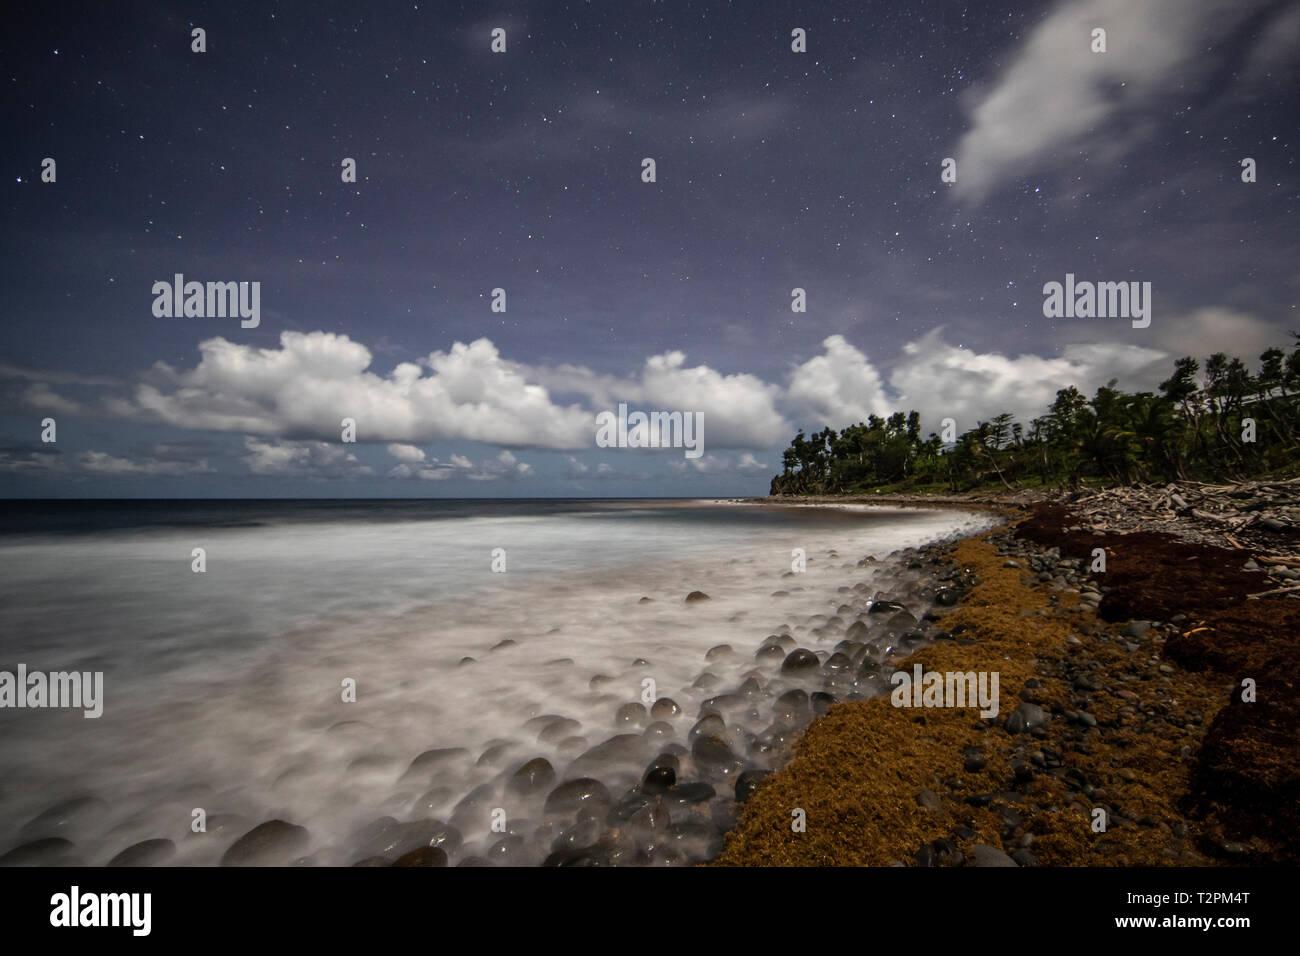 Coastline at night, La Plaine, Dominica, Caribbean - Stock Image